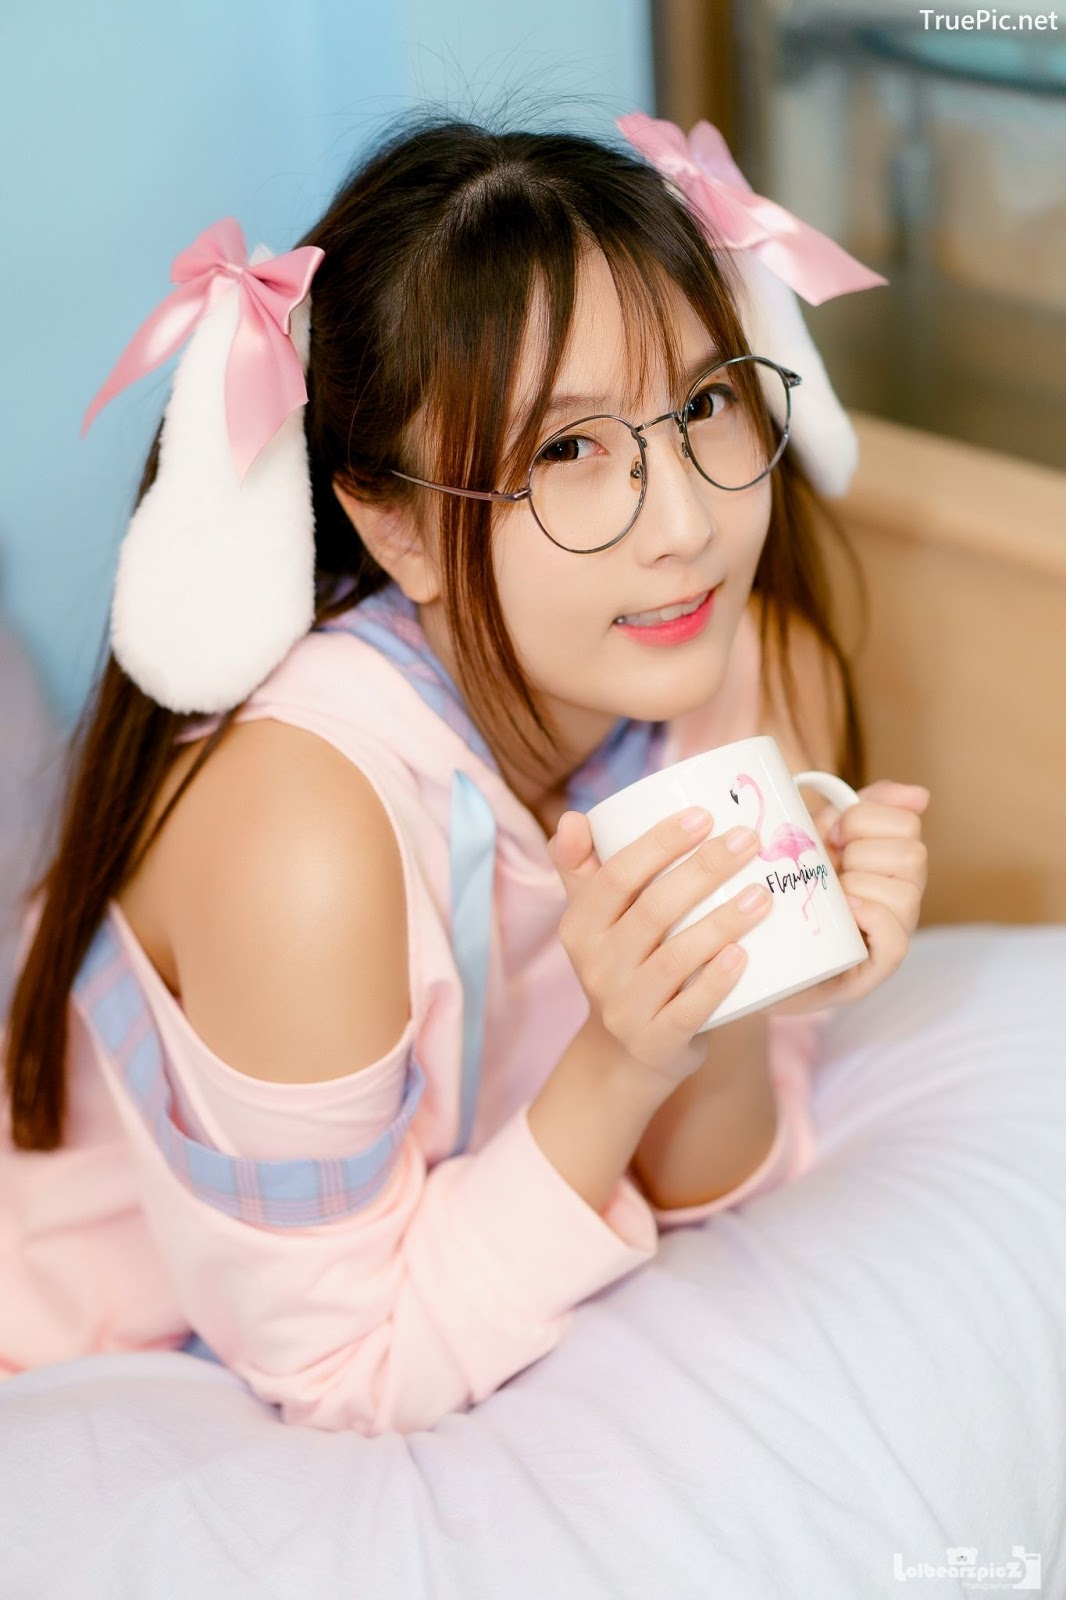 Image Thailand Model - Phunnita Intarapimai - Cute Rabbit Girl - TruePic.net - Picture-10